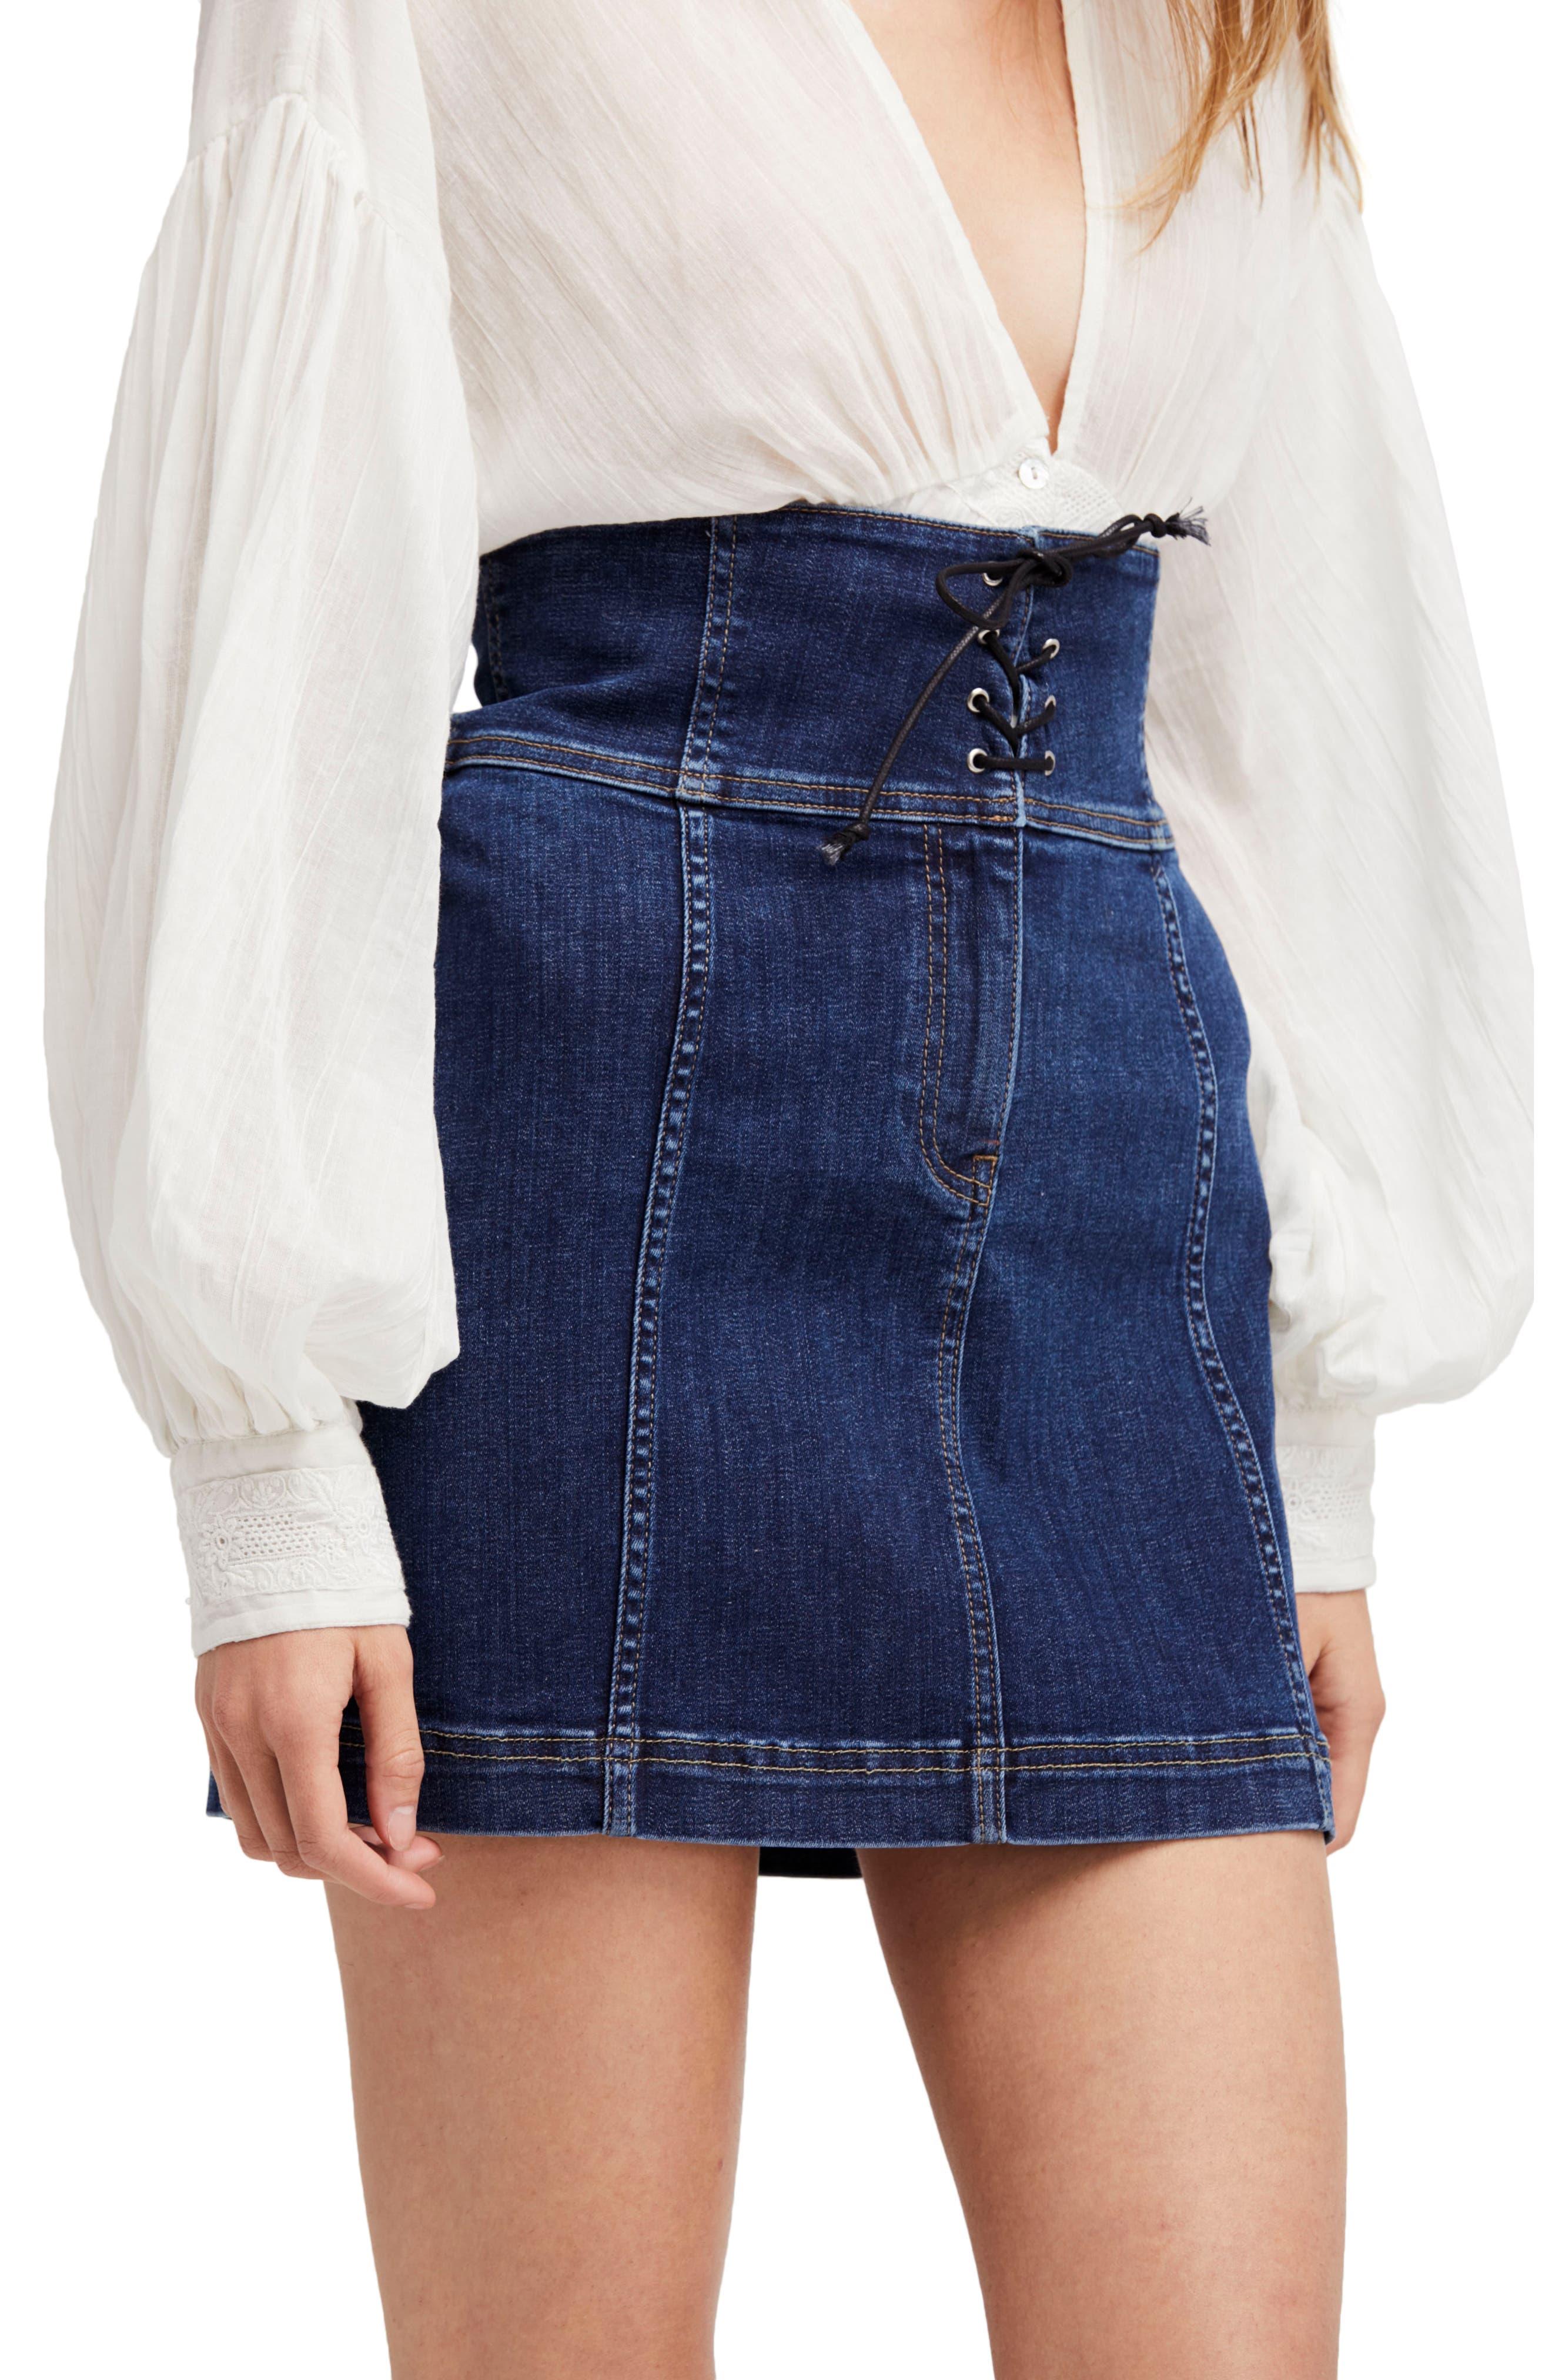 Main Image - Free People Modern Femme Corset Skirt